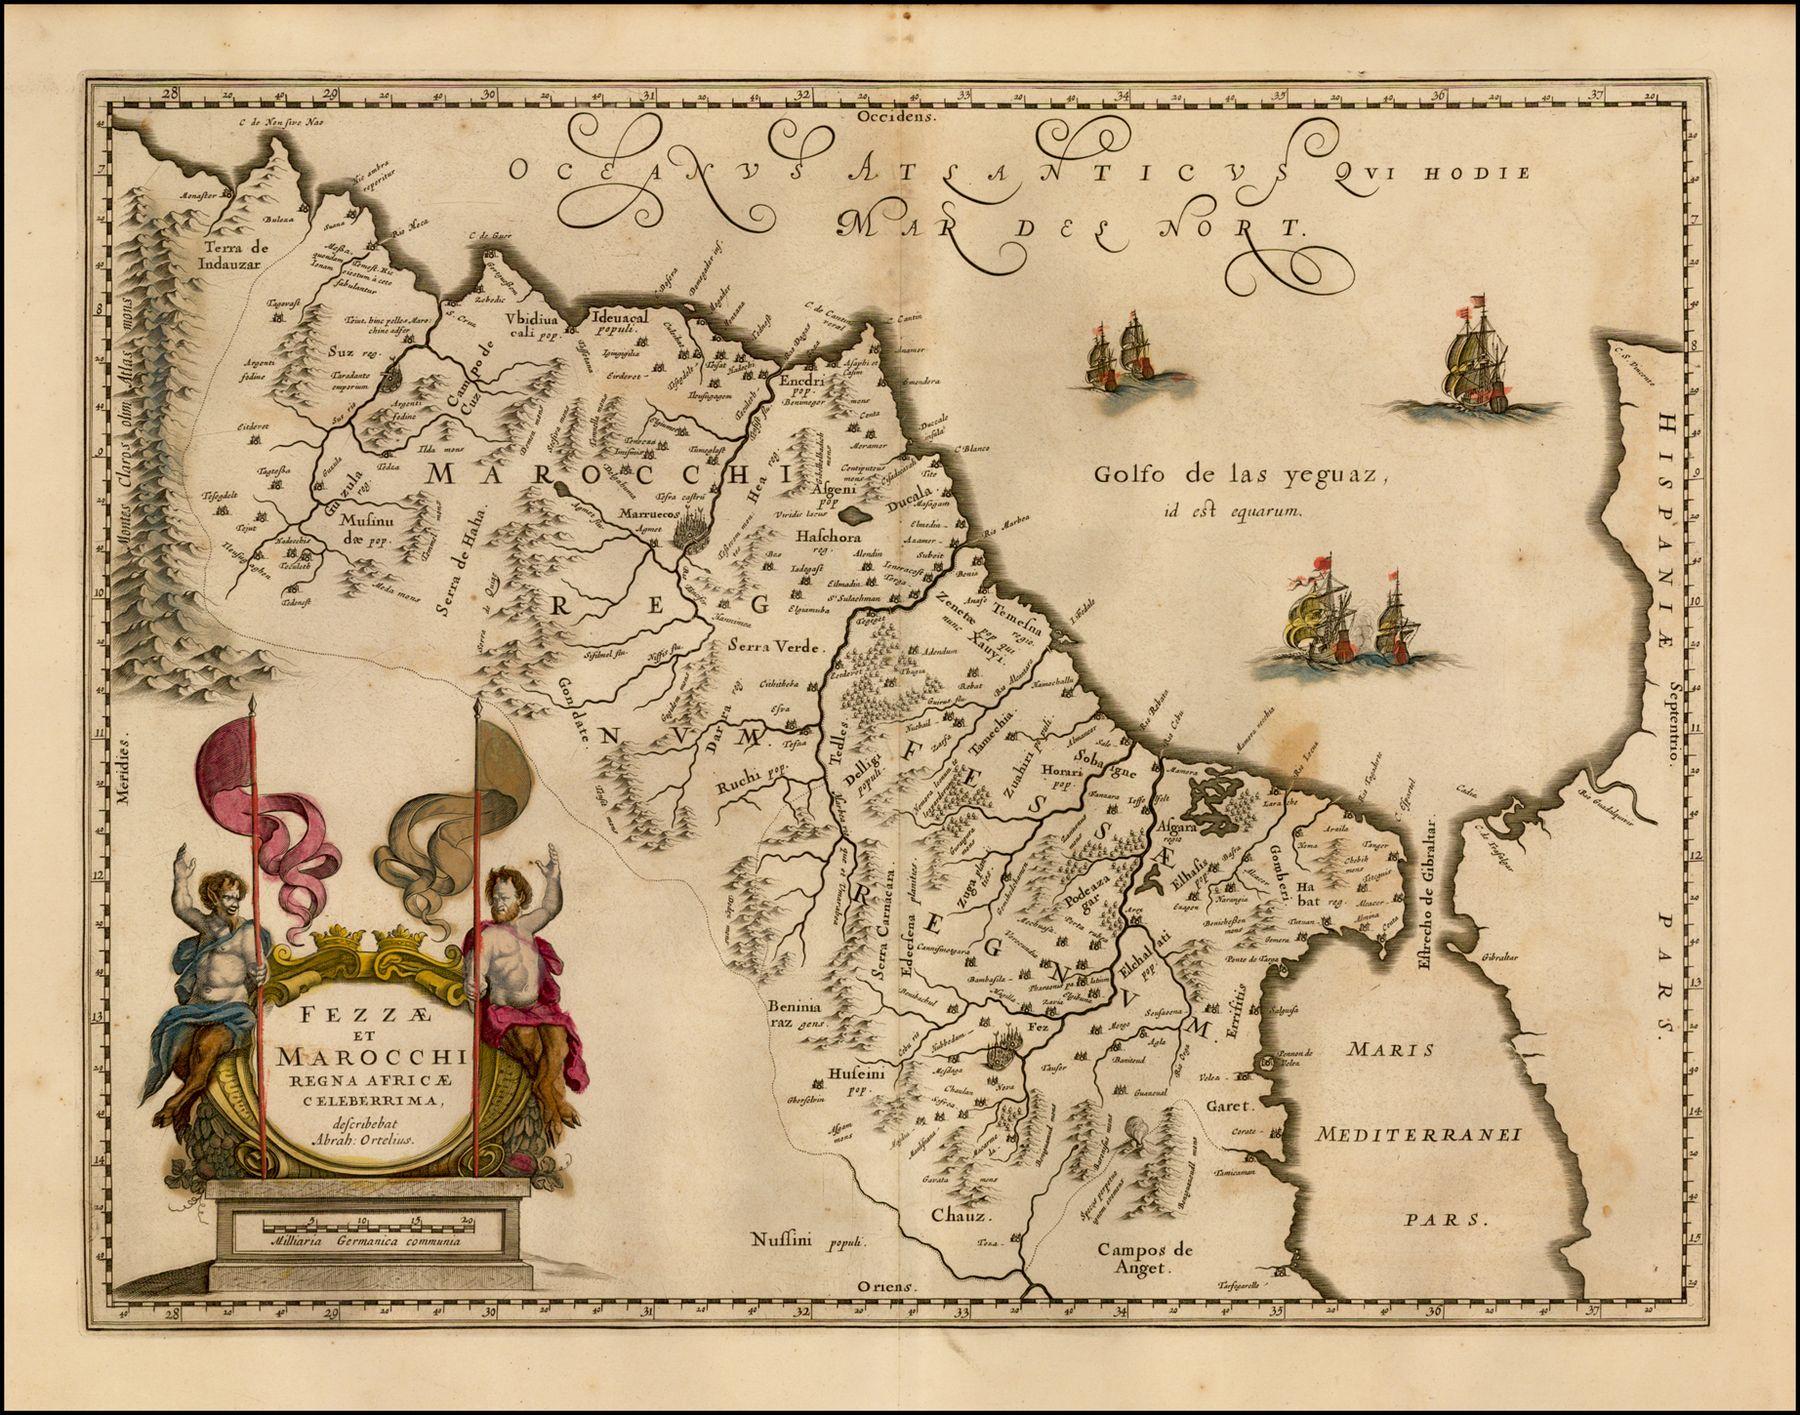 «Fezzae et Marocchi regna Africae celebérrima» por Jan Jansson basado en Abraham Ortelius. Amsterdam, 1635